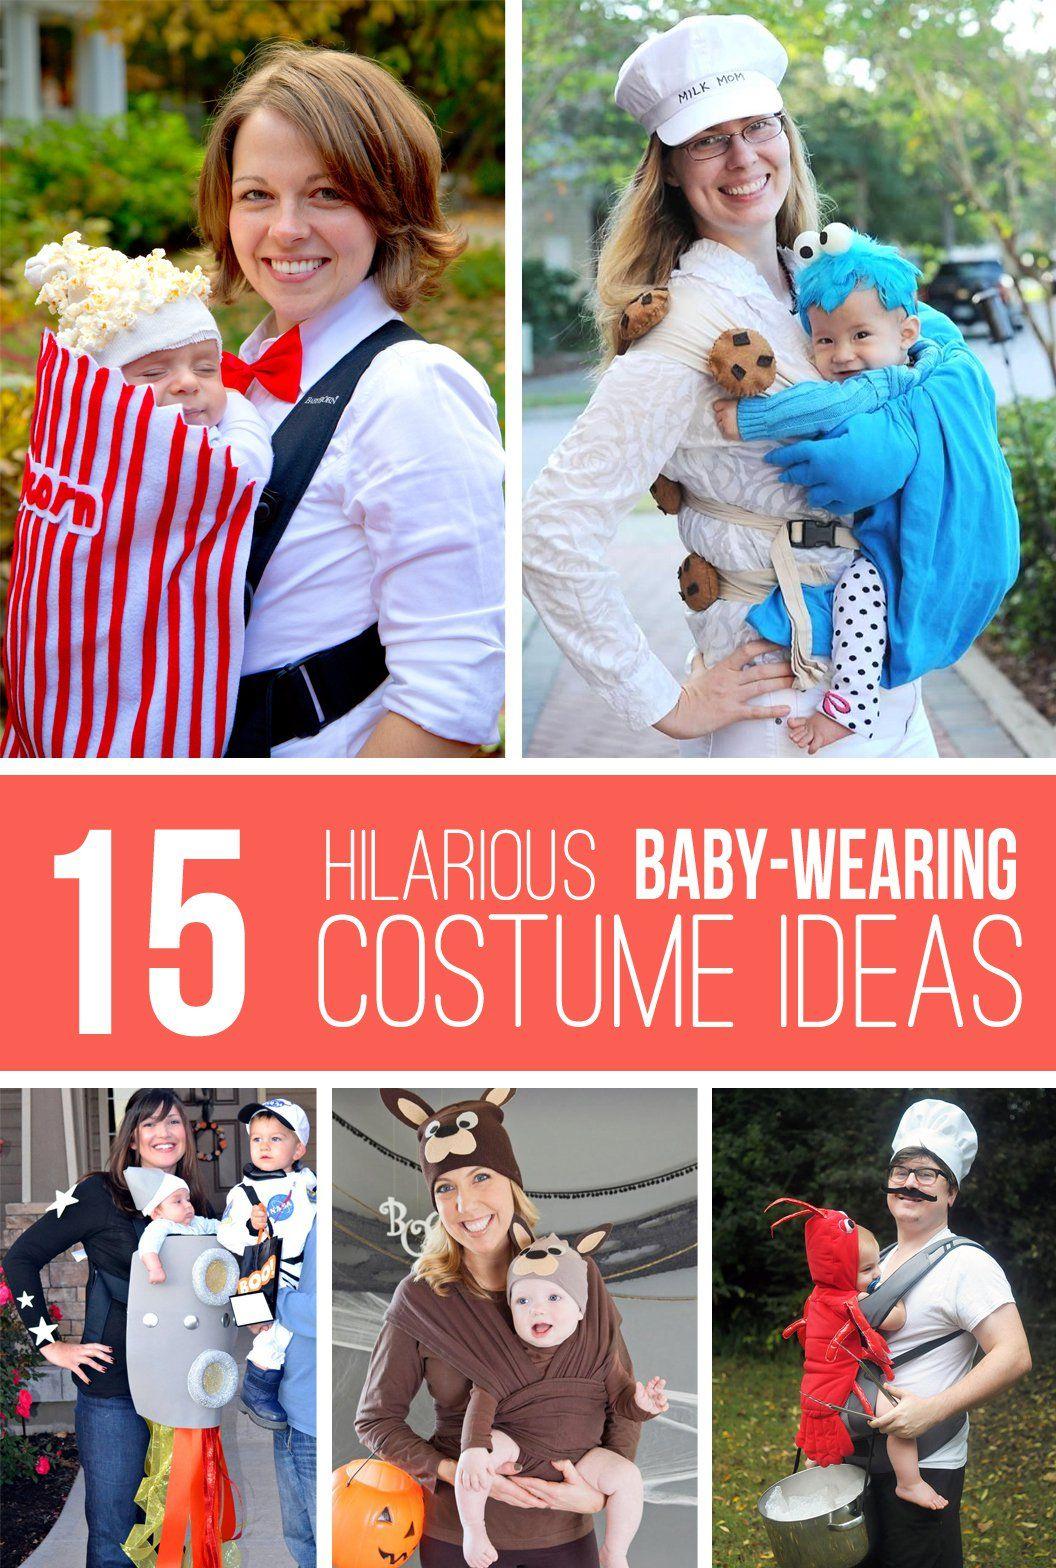 15 hilarious baby wearing costume ideas hilarious costumes and 15 hilarious baby wearing costume ideas solutioingenieria Gallery